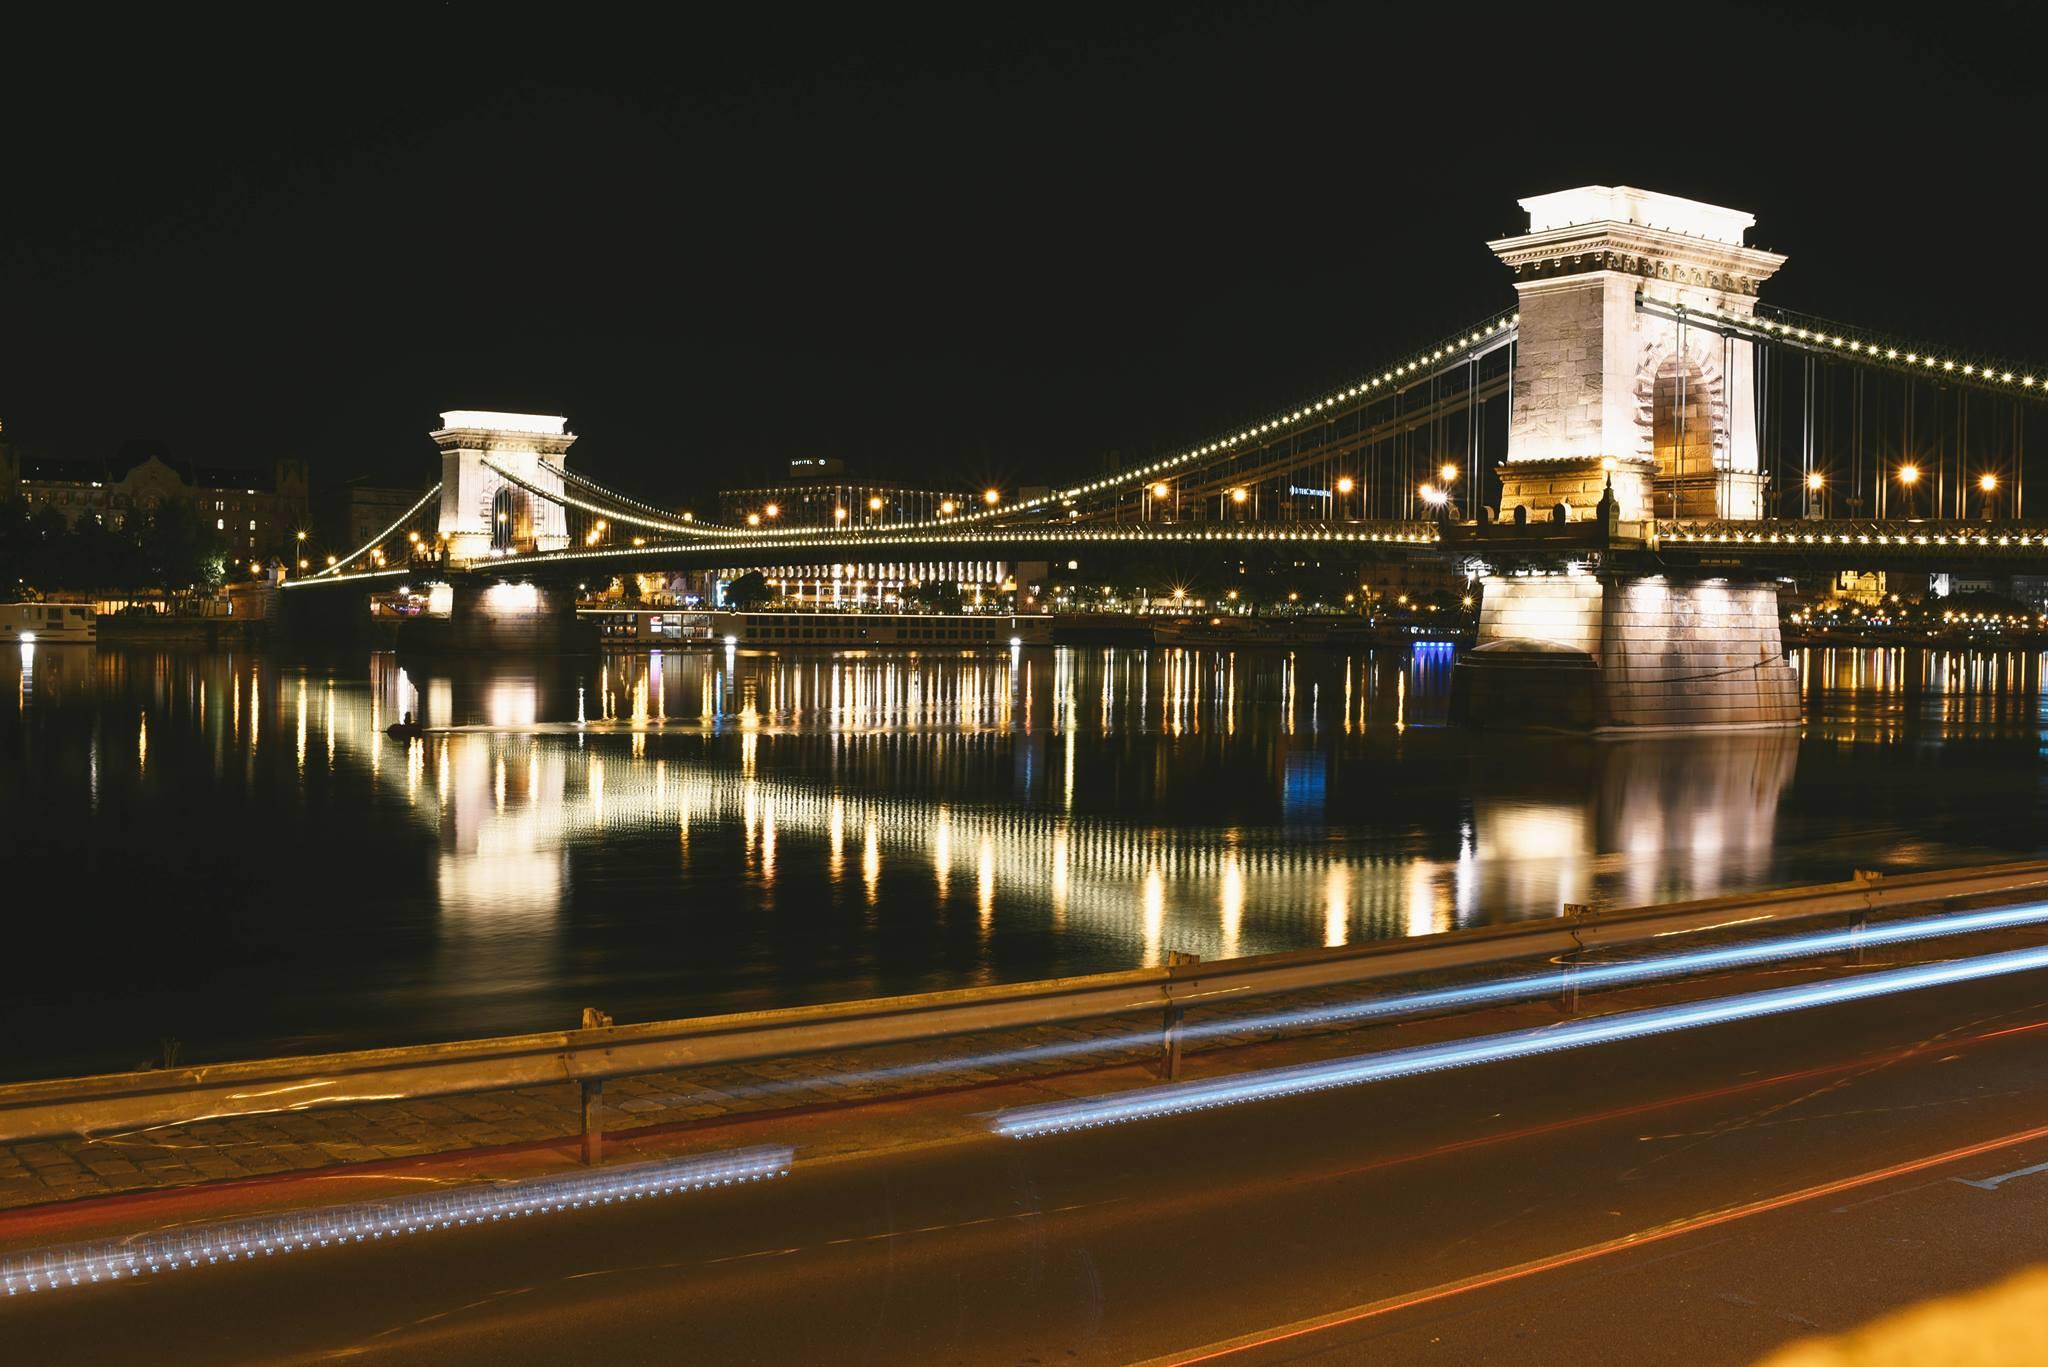 Cầu Xích (